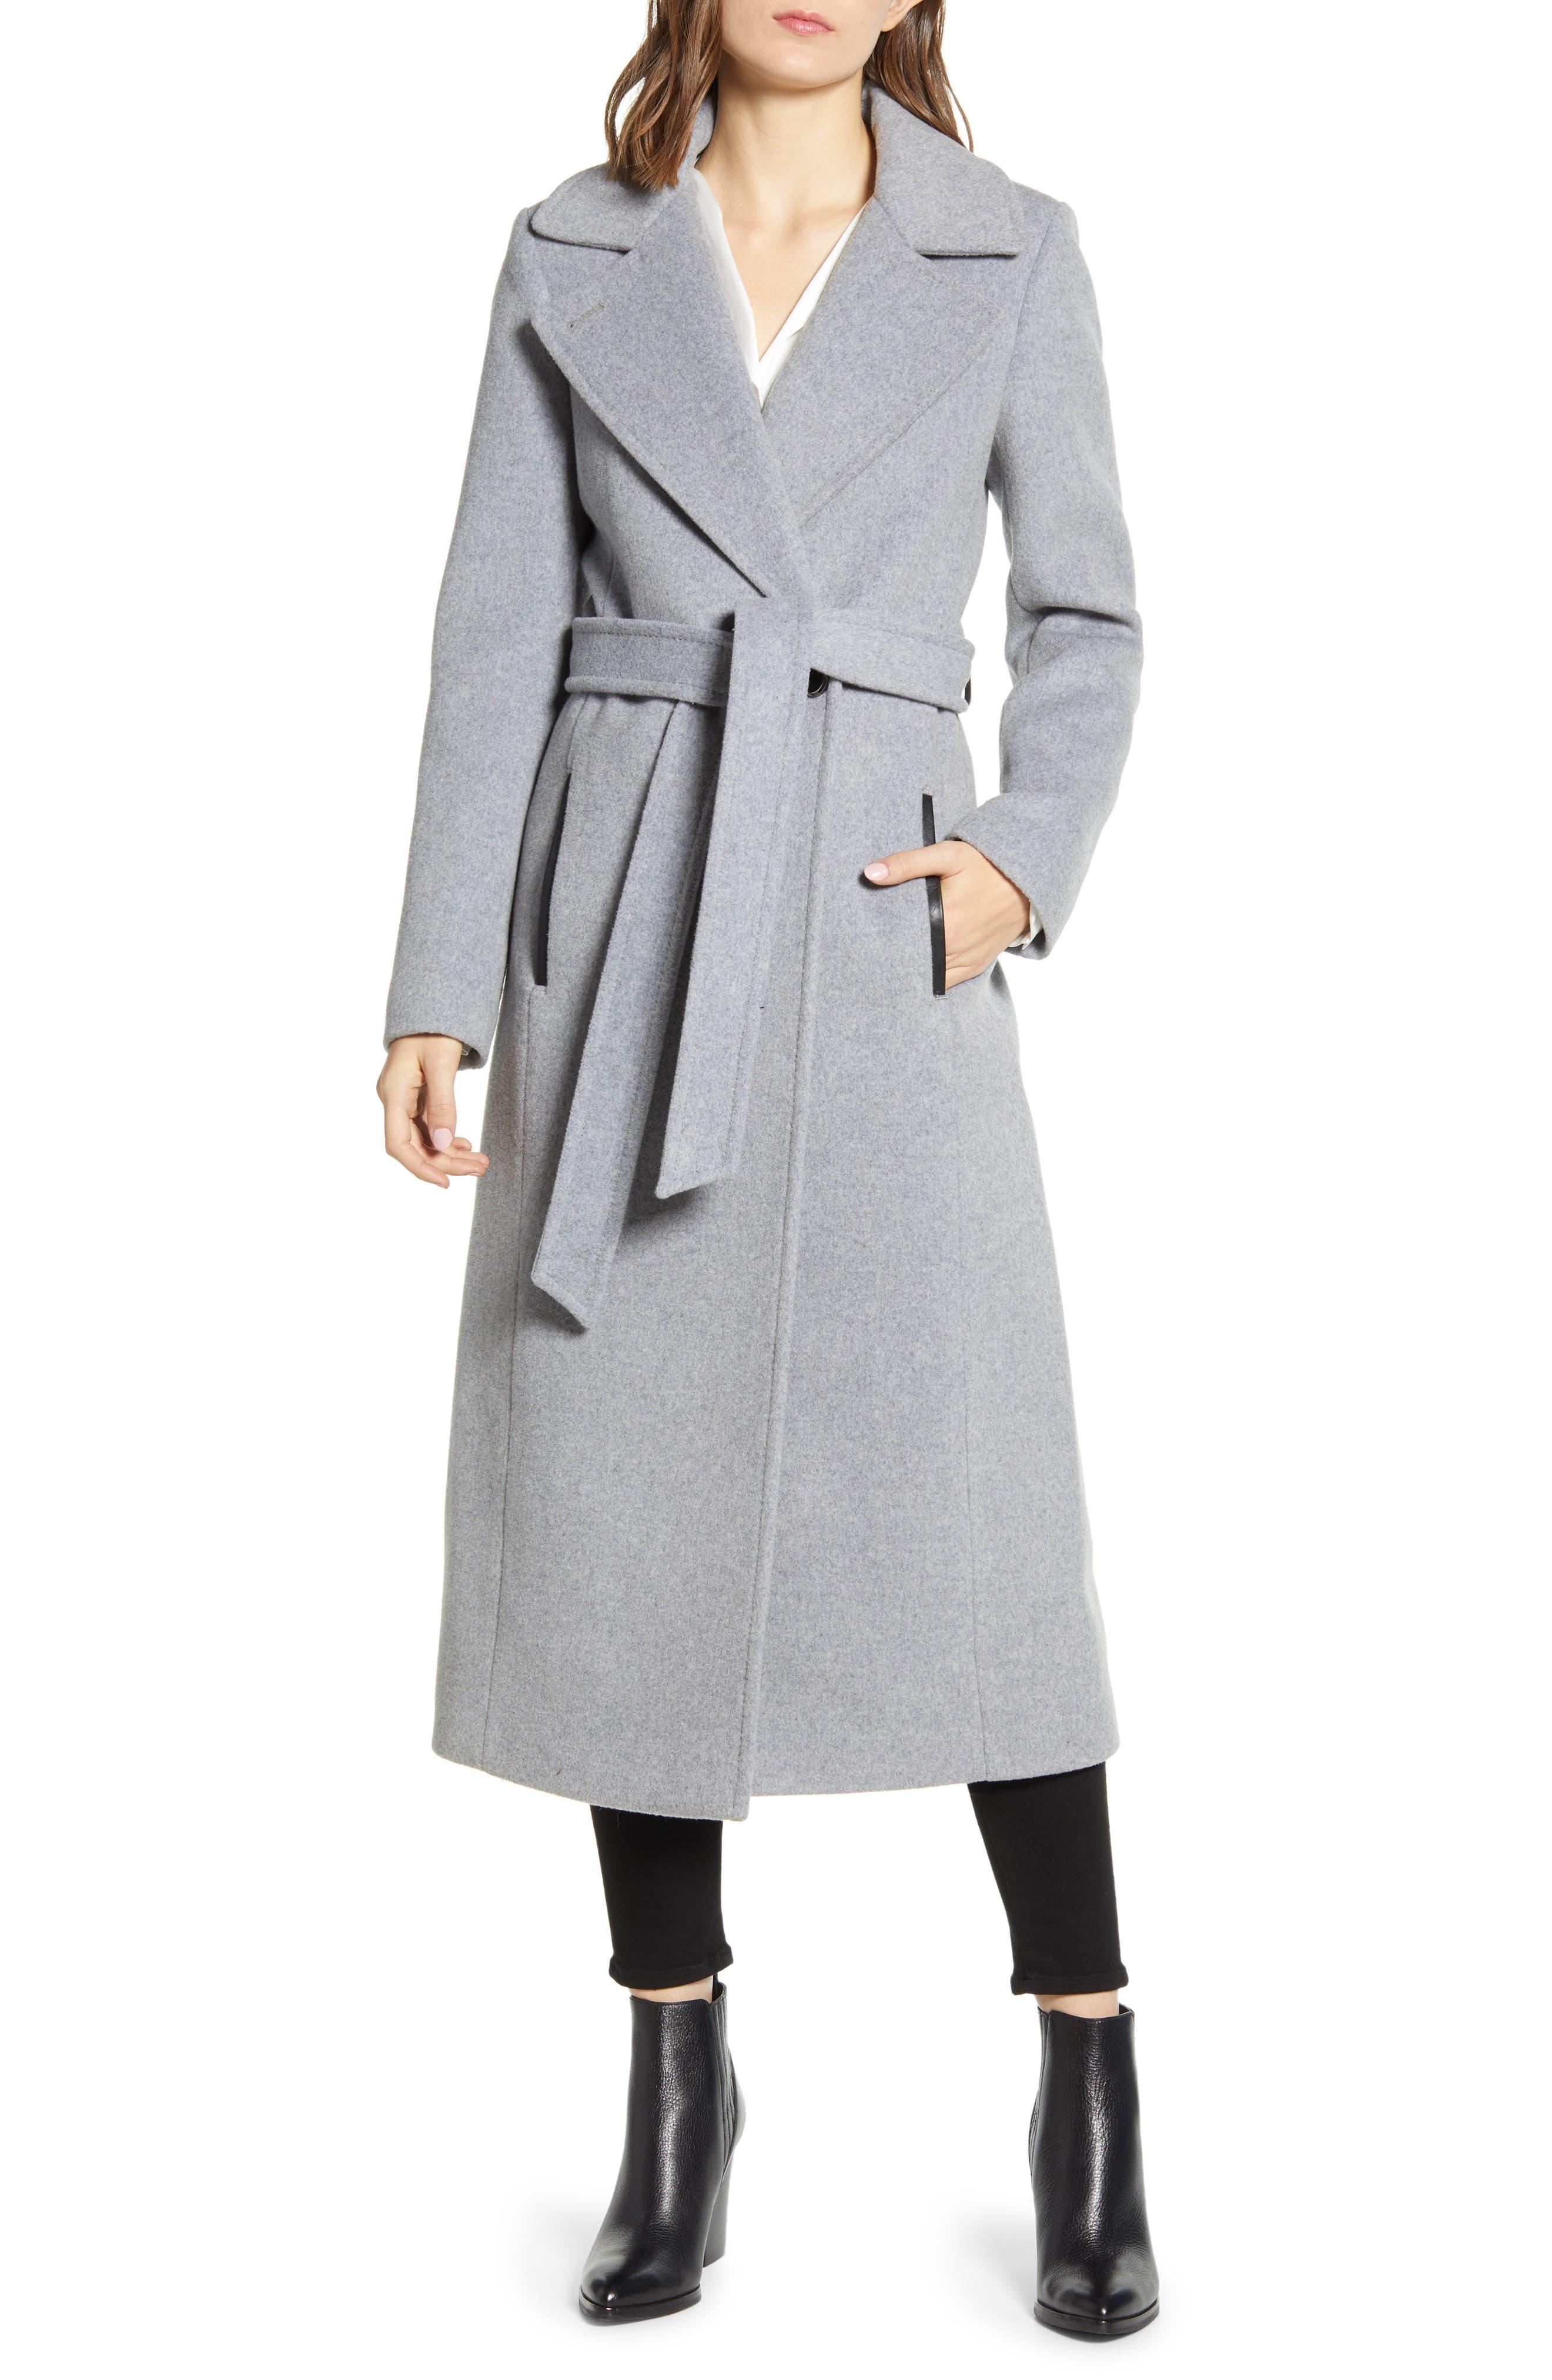 Mackage Evaline-S Long Wool Blend Coat (Nordstrom Exclusive)